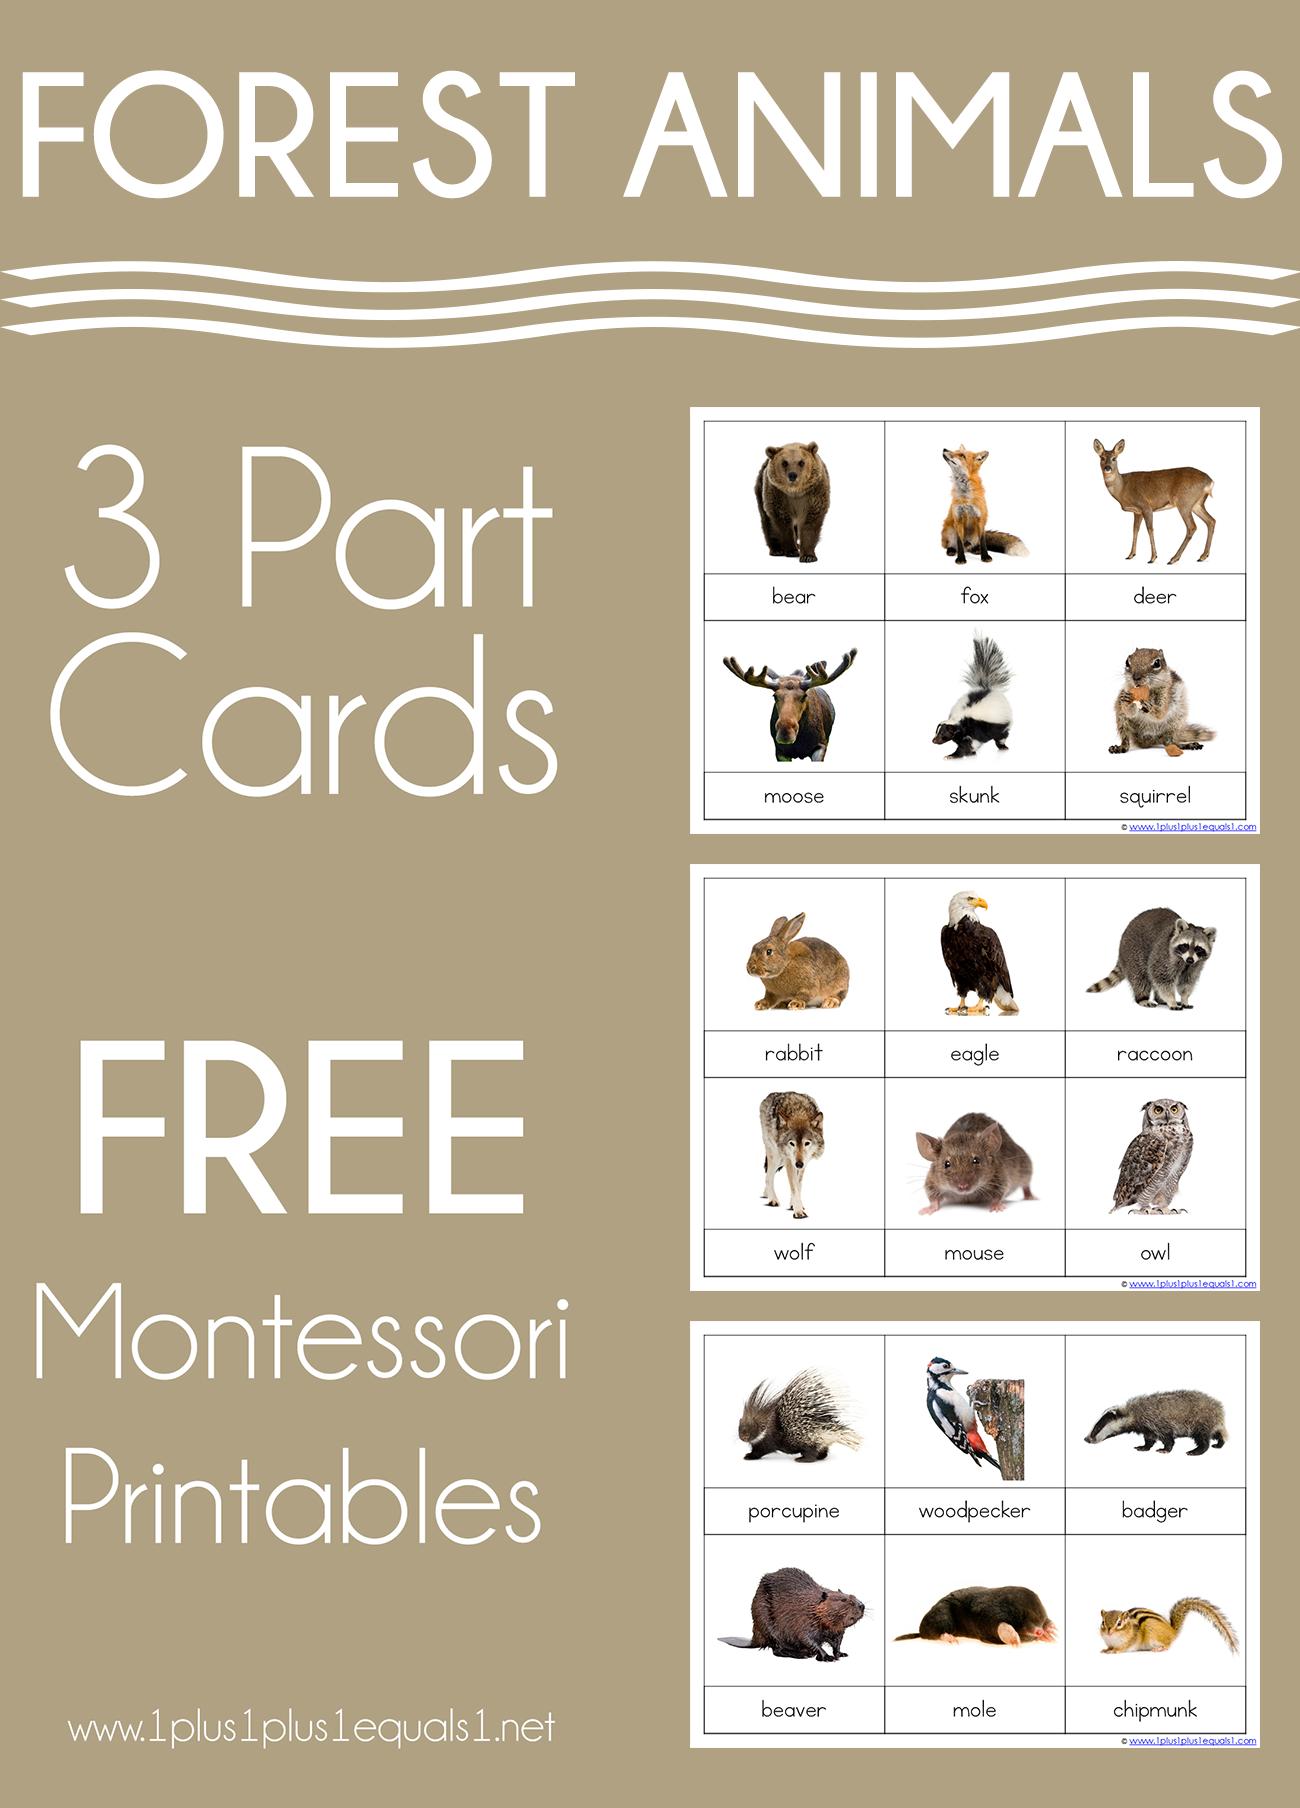 Forest Animals Montessori Printables Free 3 Part Cards 1 1 1 1